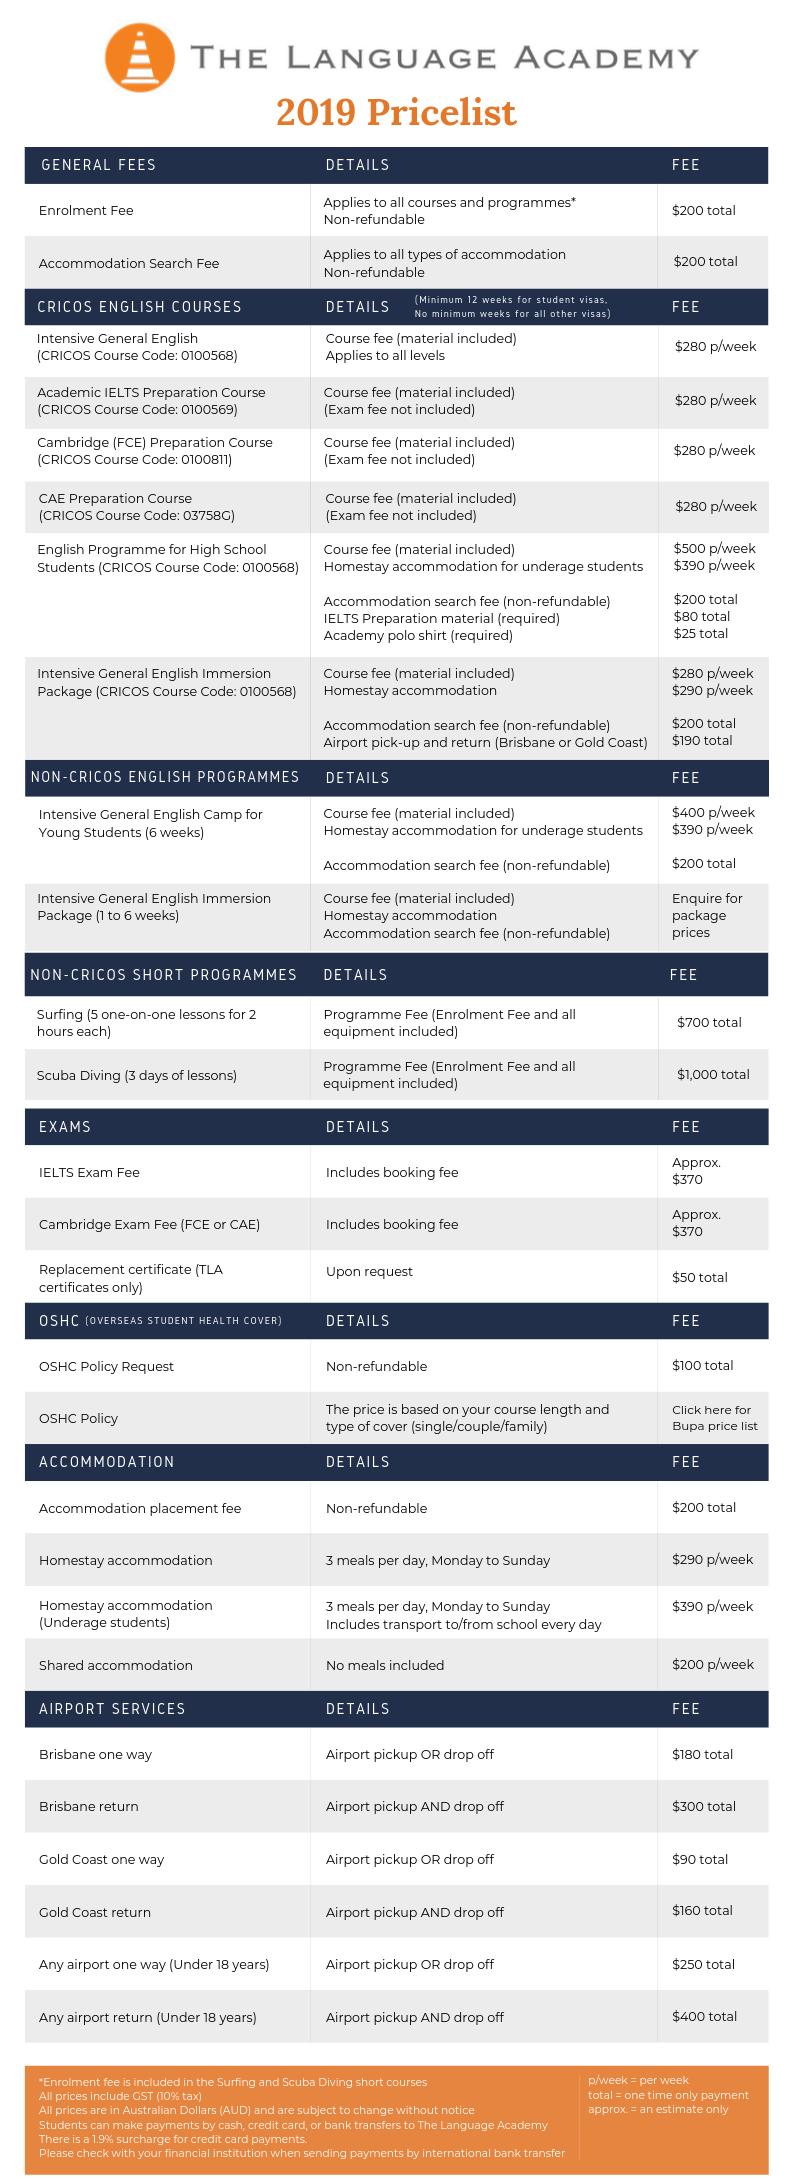 Pricelist - The Language Academy (Updated 11-10-19)